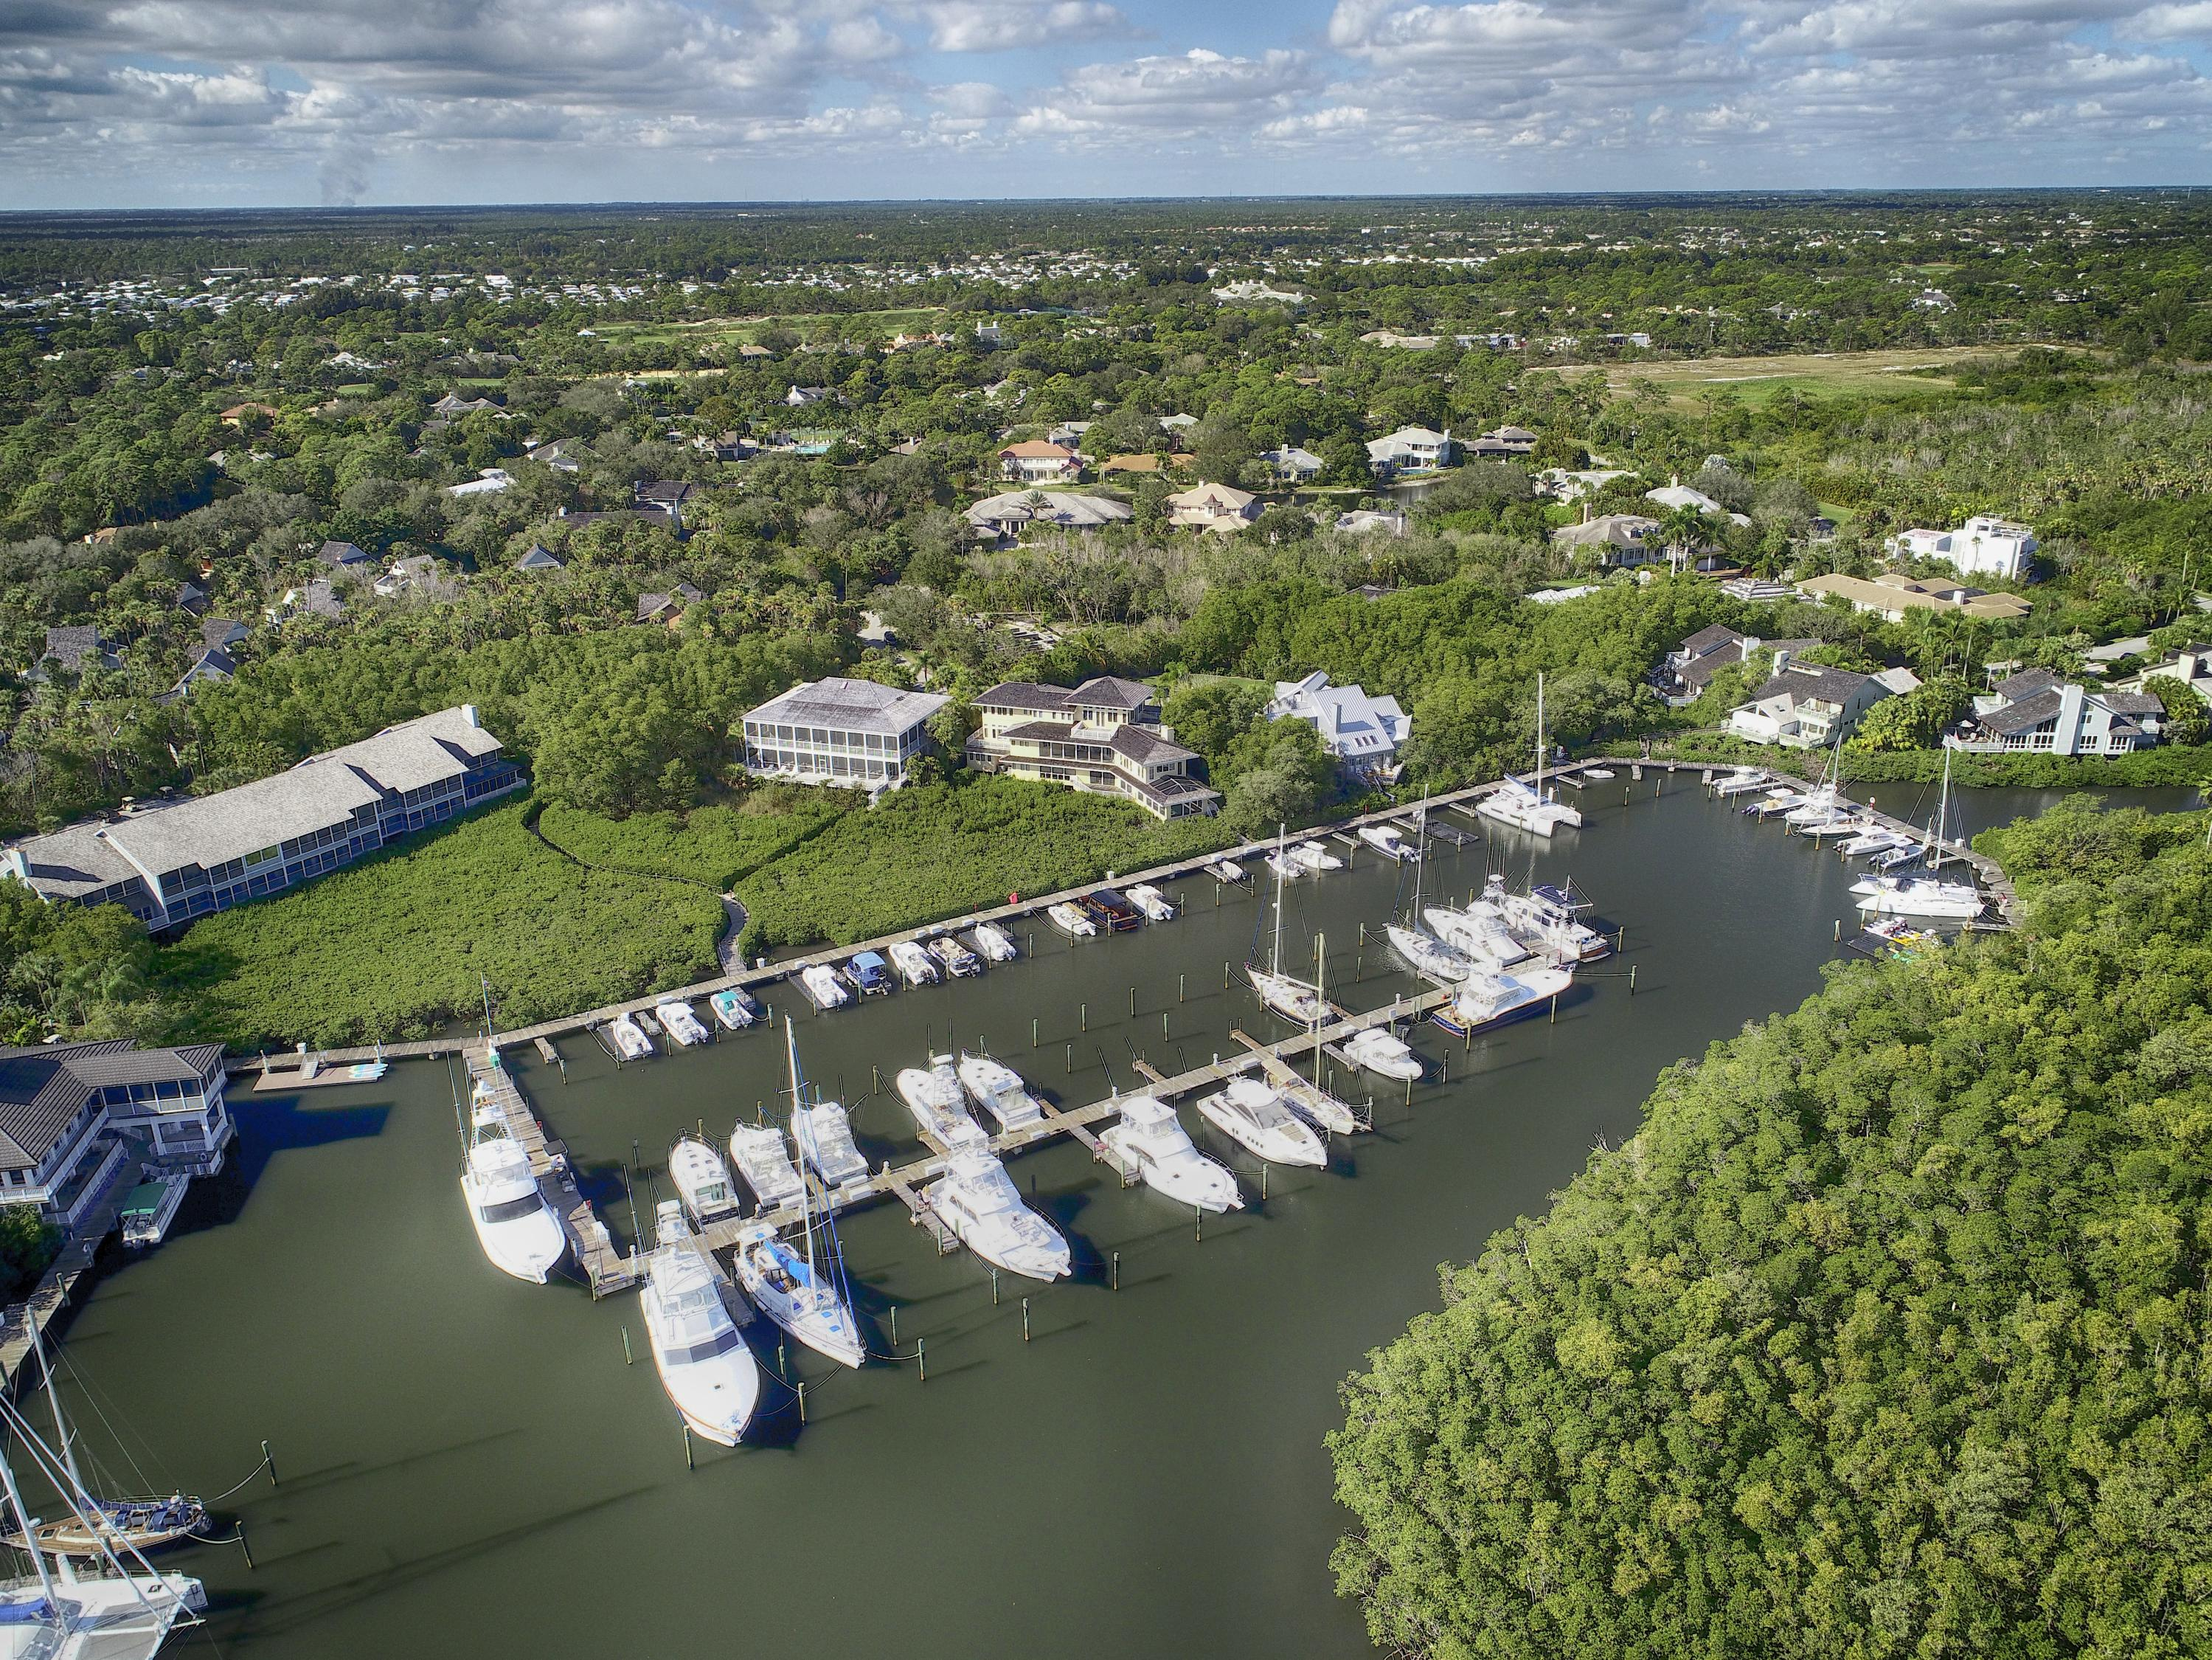 LOBLOLLY BAY HOBE SOUND FLORIDA